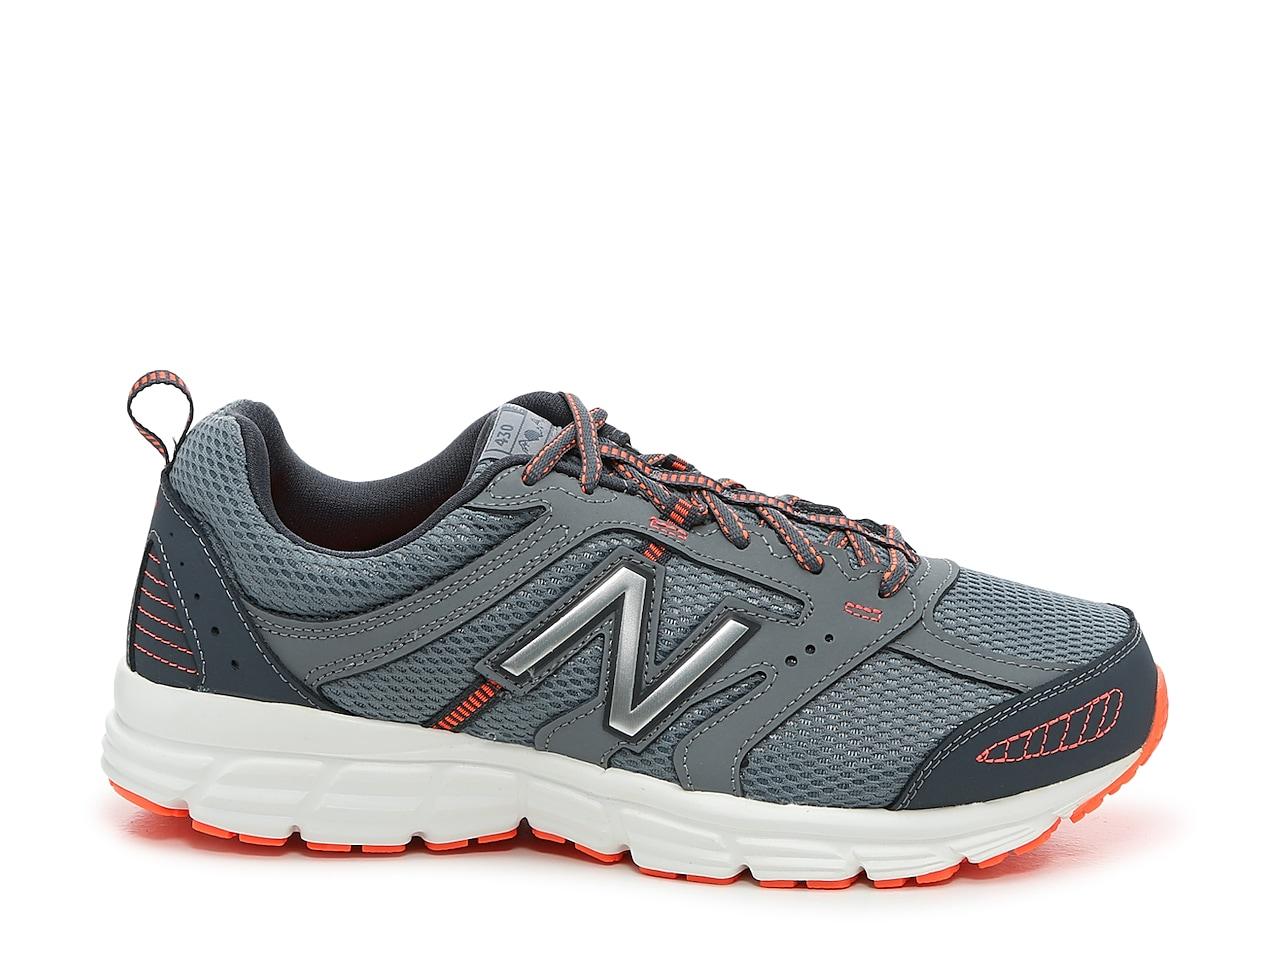 New Balance 430 Running Shoe - Men's | DSW